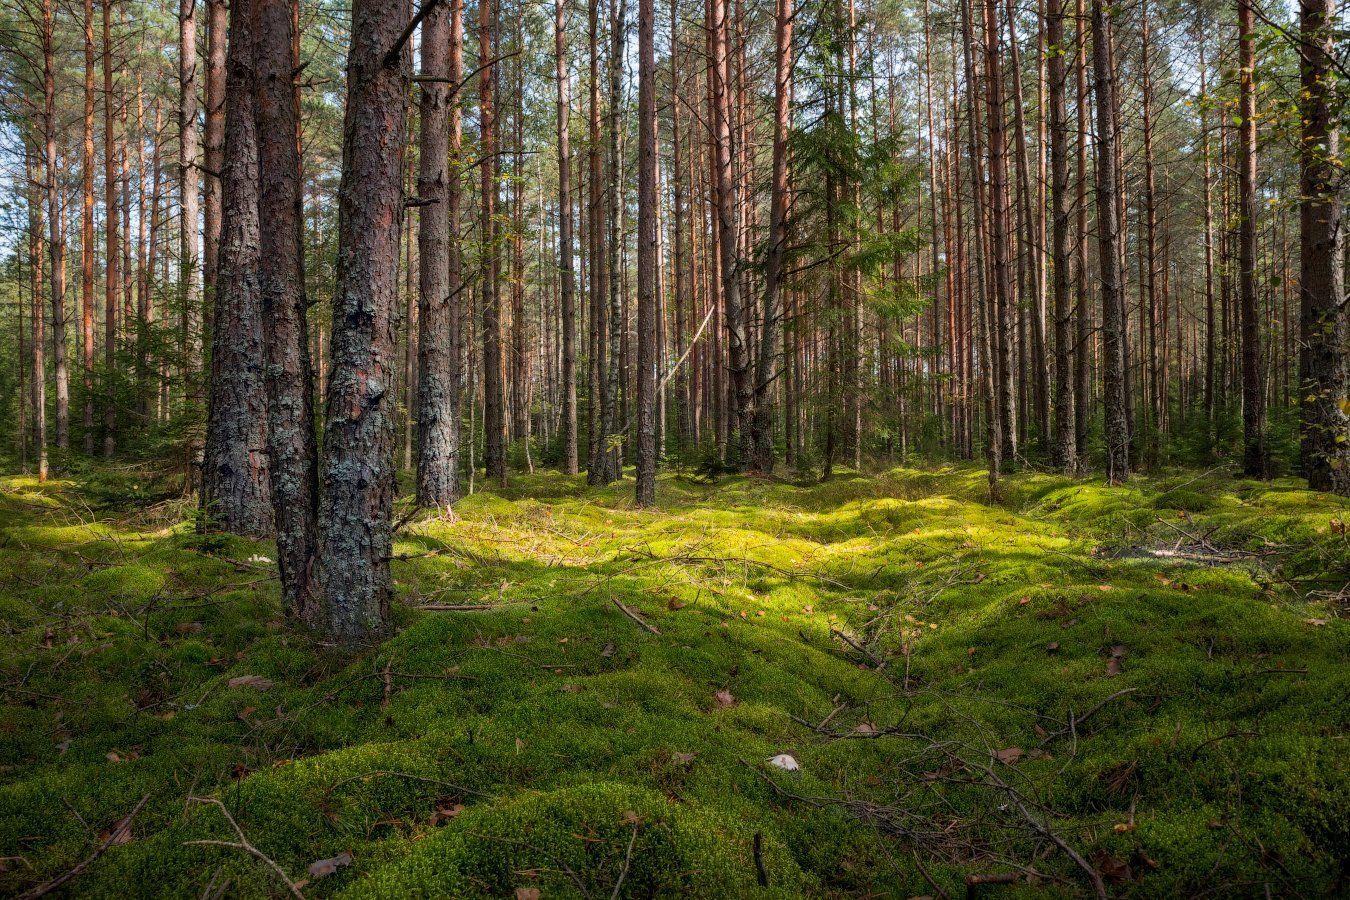 осень, лес,мох, деревья,, Сергей Шабуневич